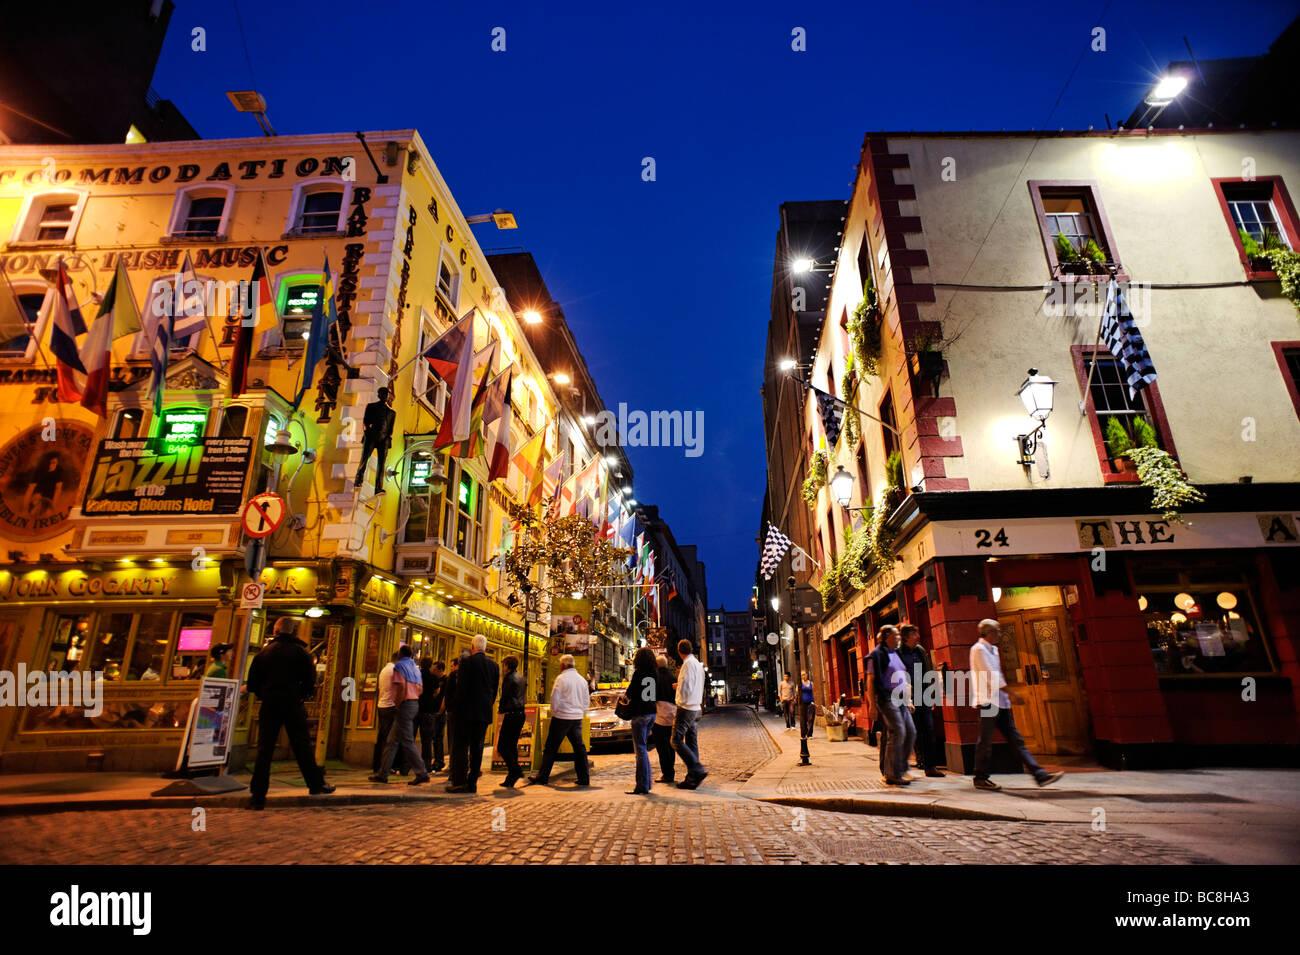 Reihe von Pubs entlang der geschäftigen Temple Bar Nachtleben Dublin Irland Stockbild